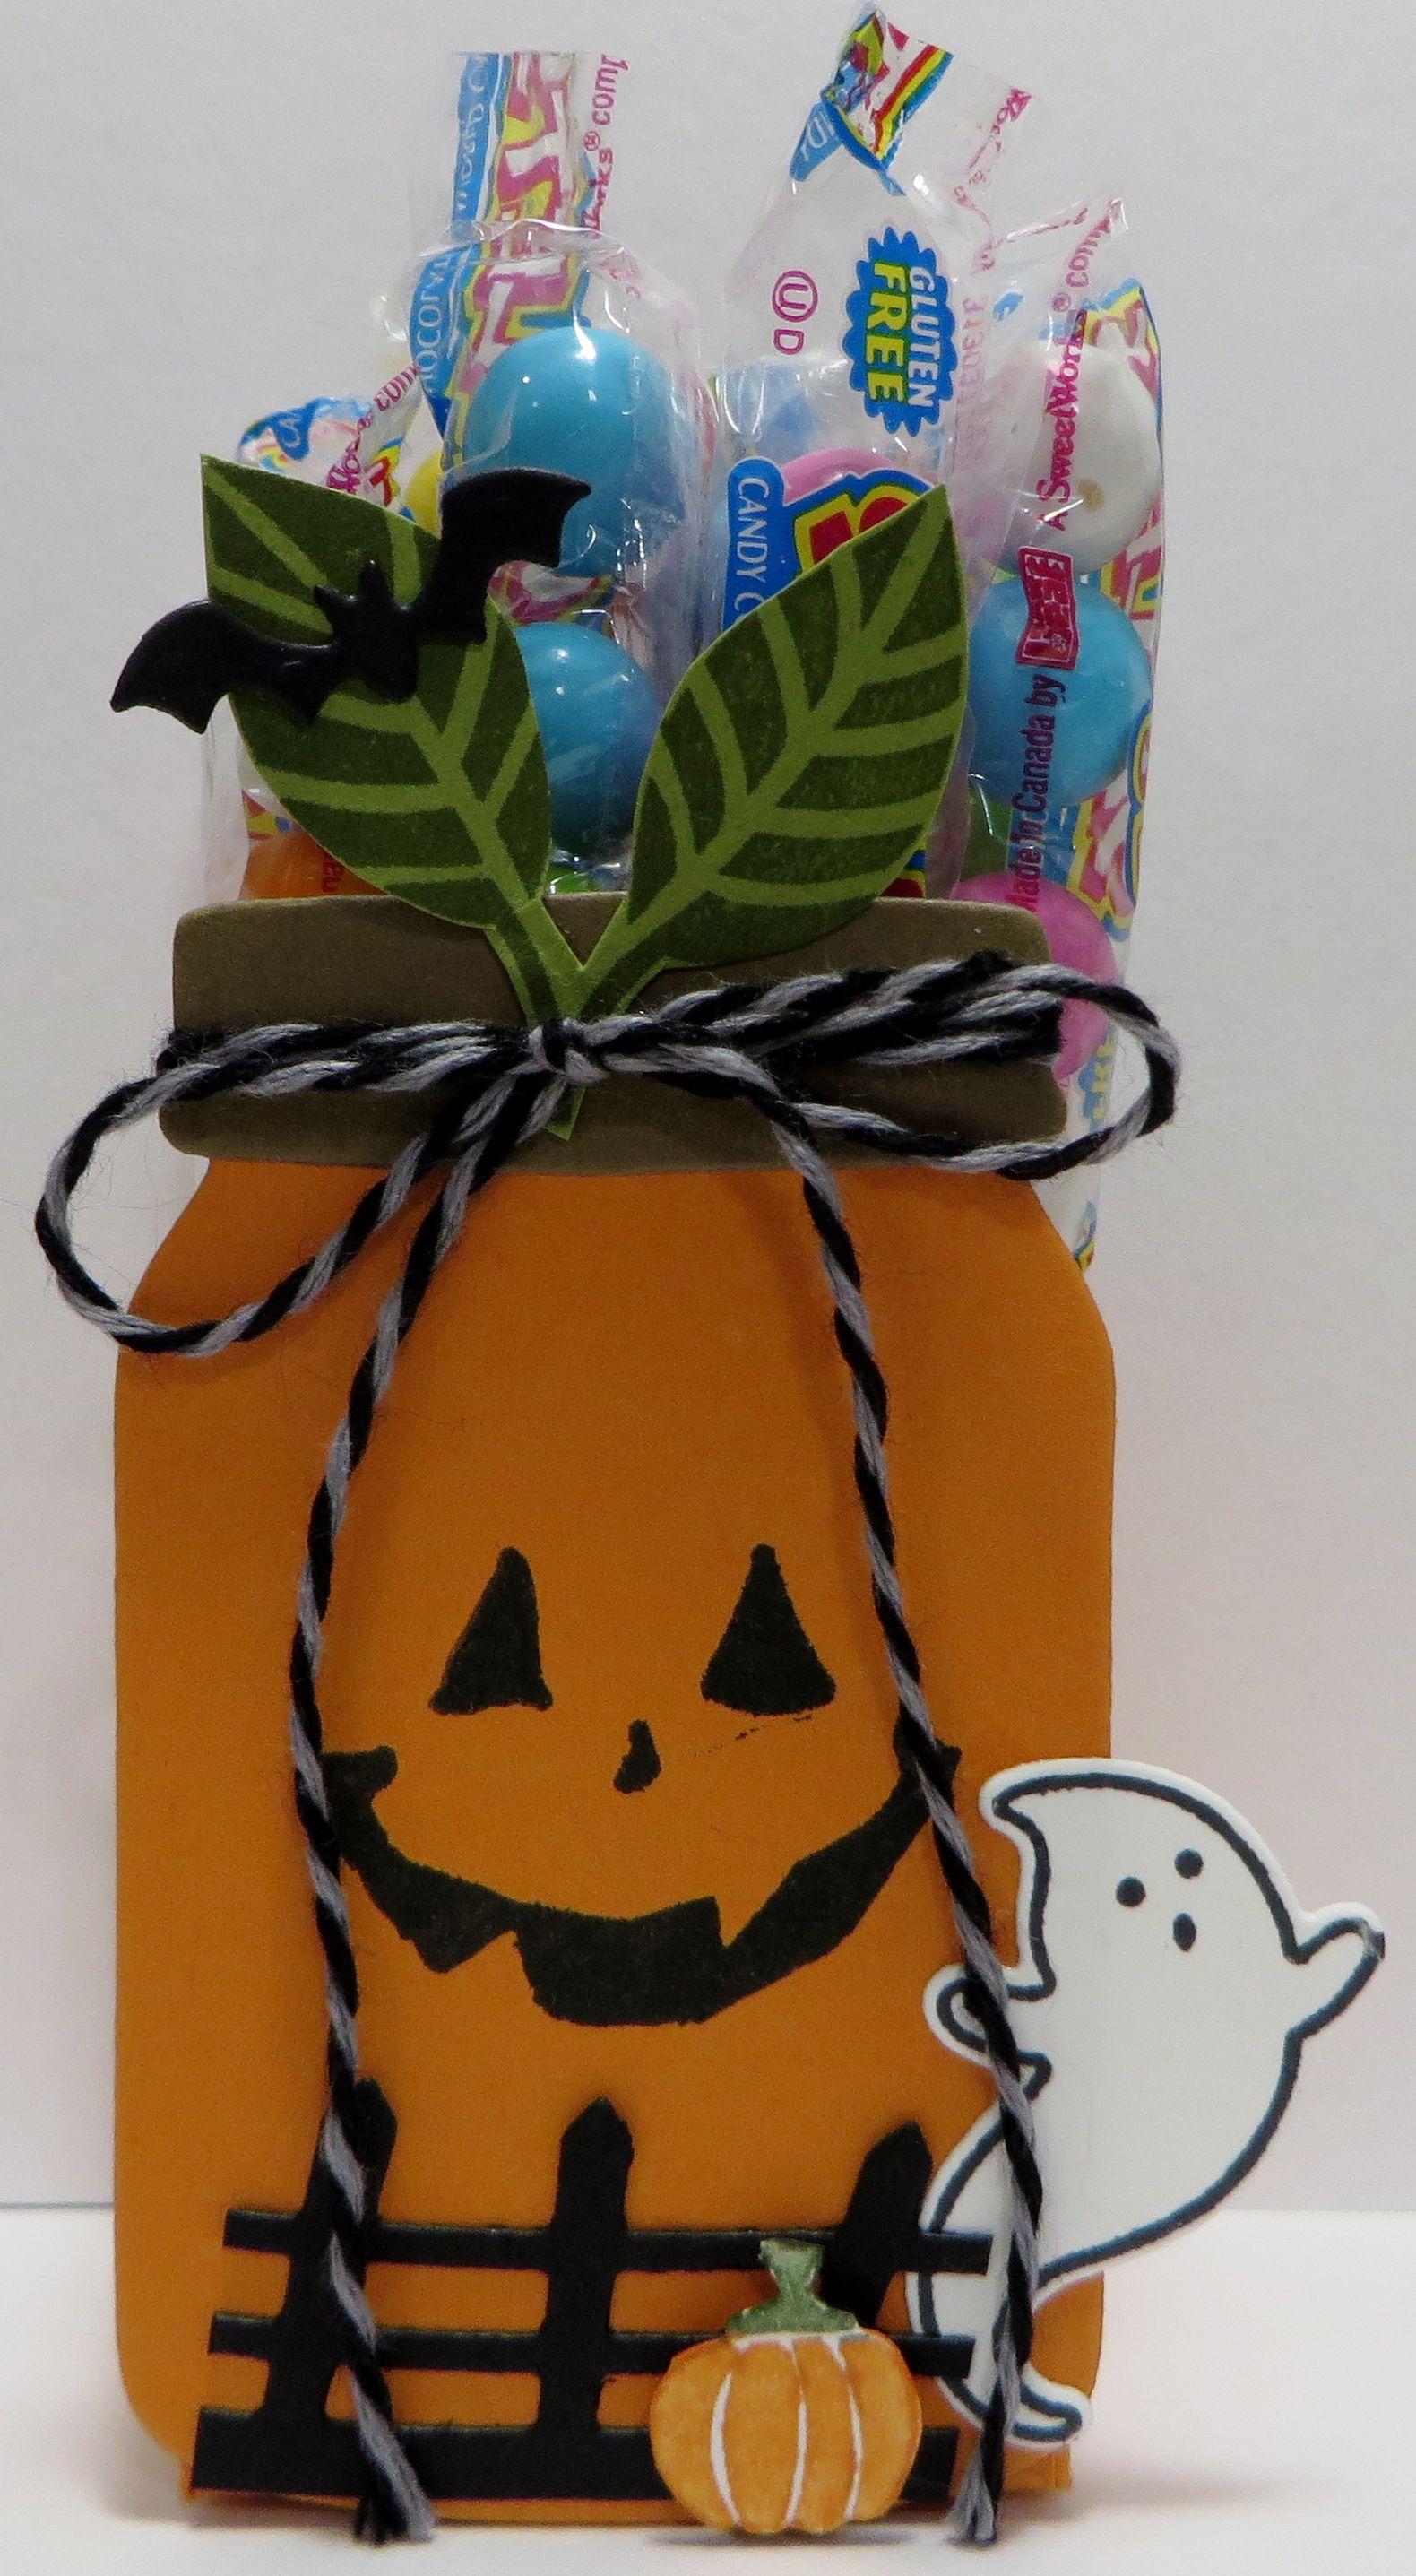 Stampin Up Everyday Jar Pumpkin Treat Holder Boxes designed by Lynn